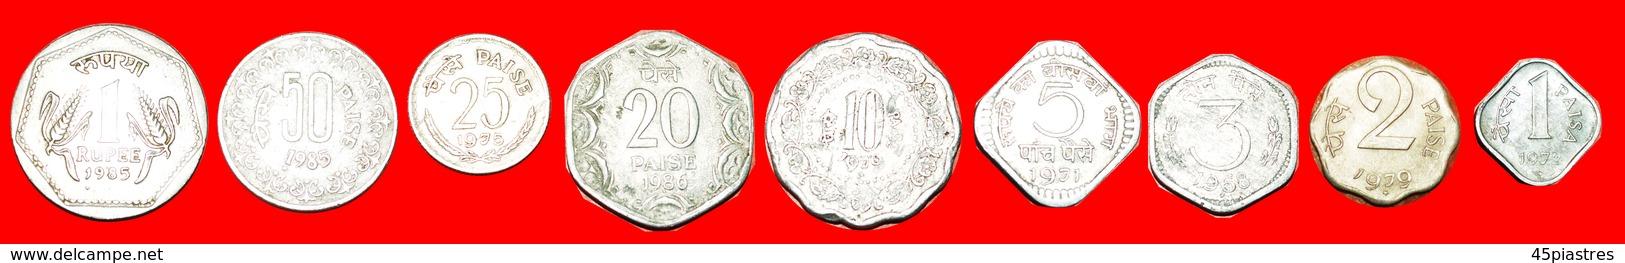 + SET 9 COINS: INDIA ★ 1-2-3-5-10-20-25-50 PAISE  - 1 RUPEE TYPE 1964-1991! LOW START ★ NO RESERVE! - Kilowaar - Munten